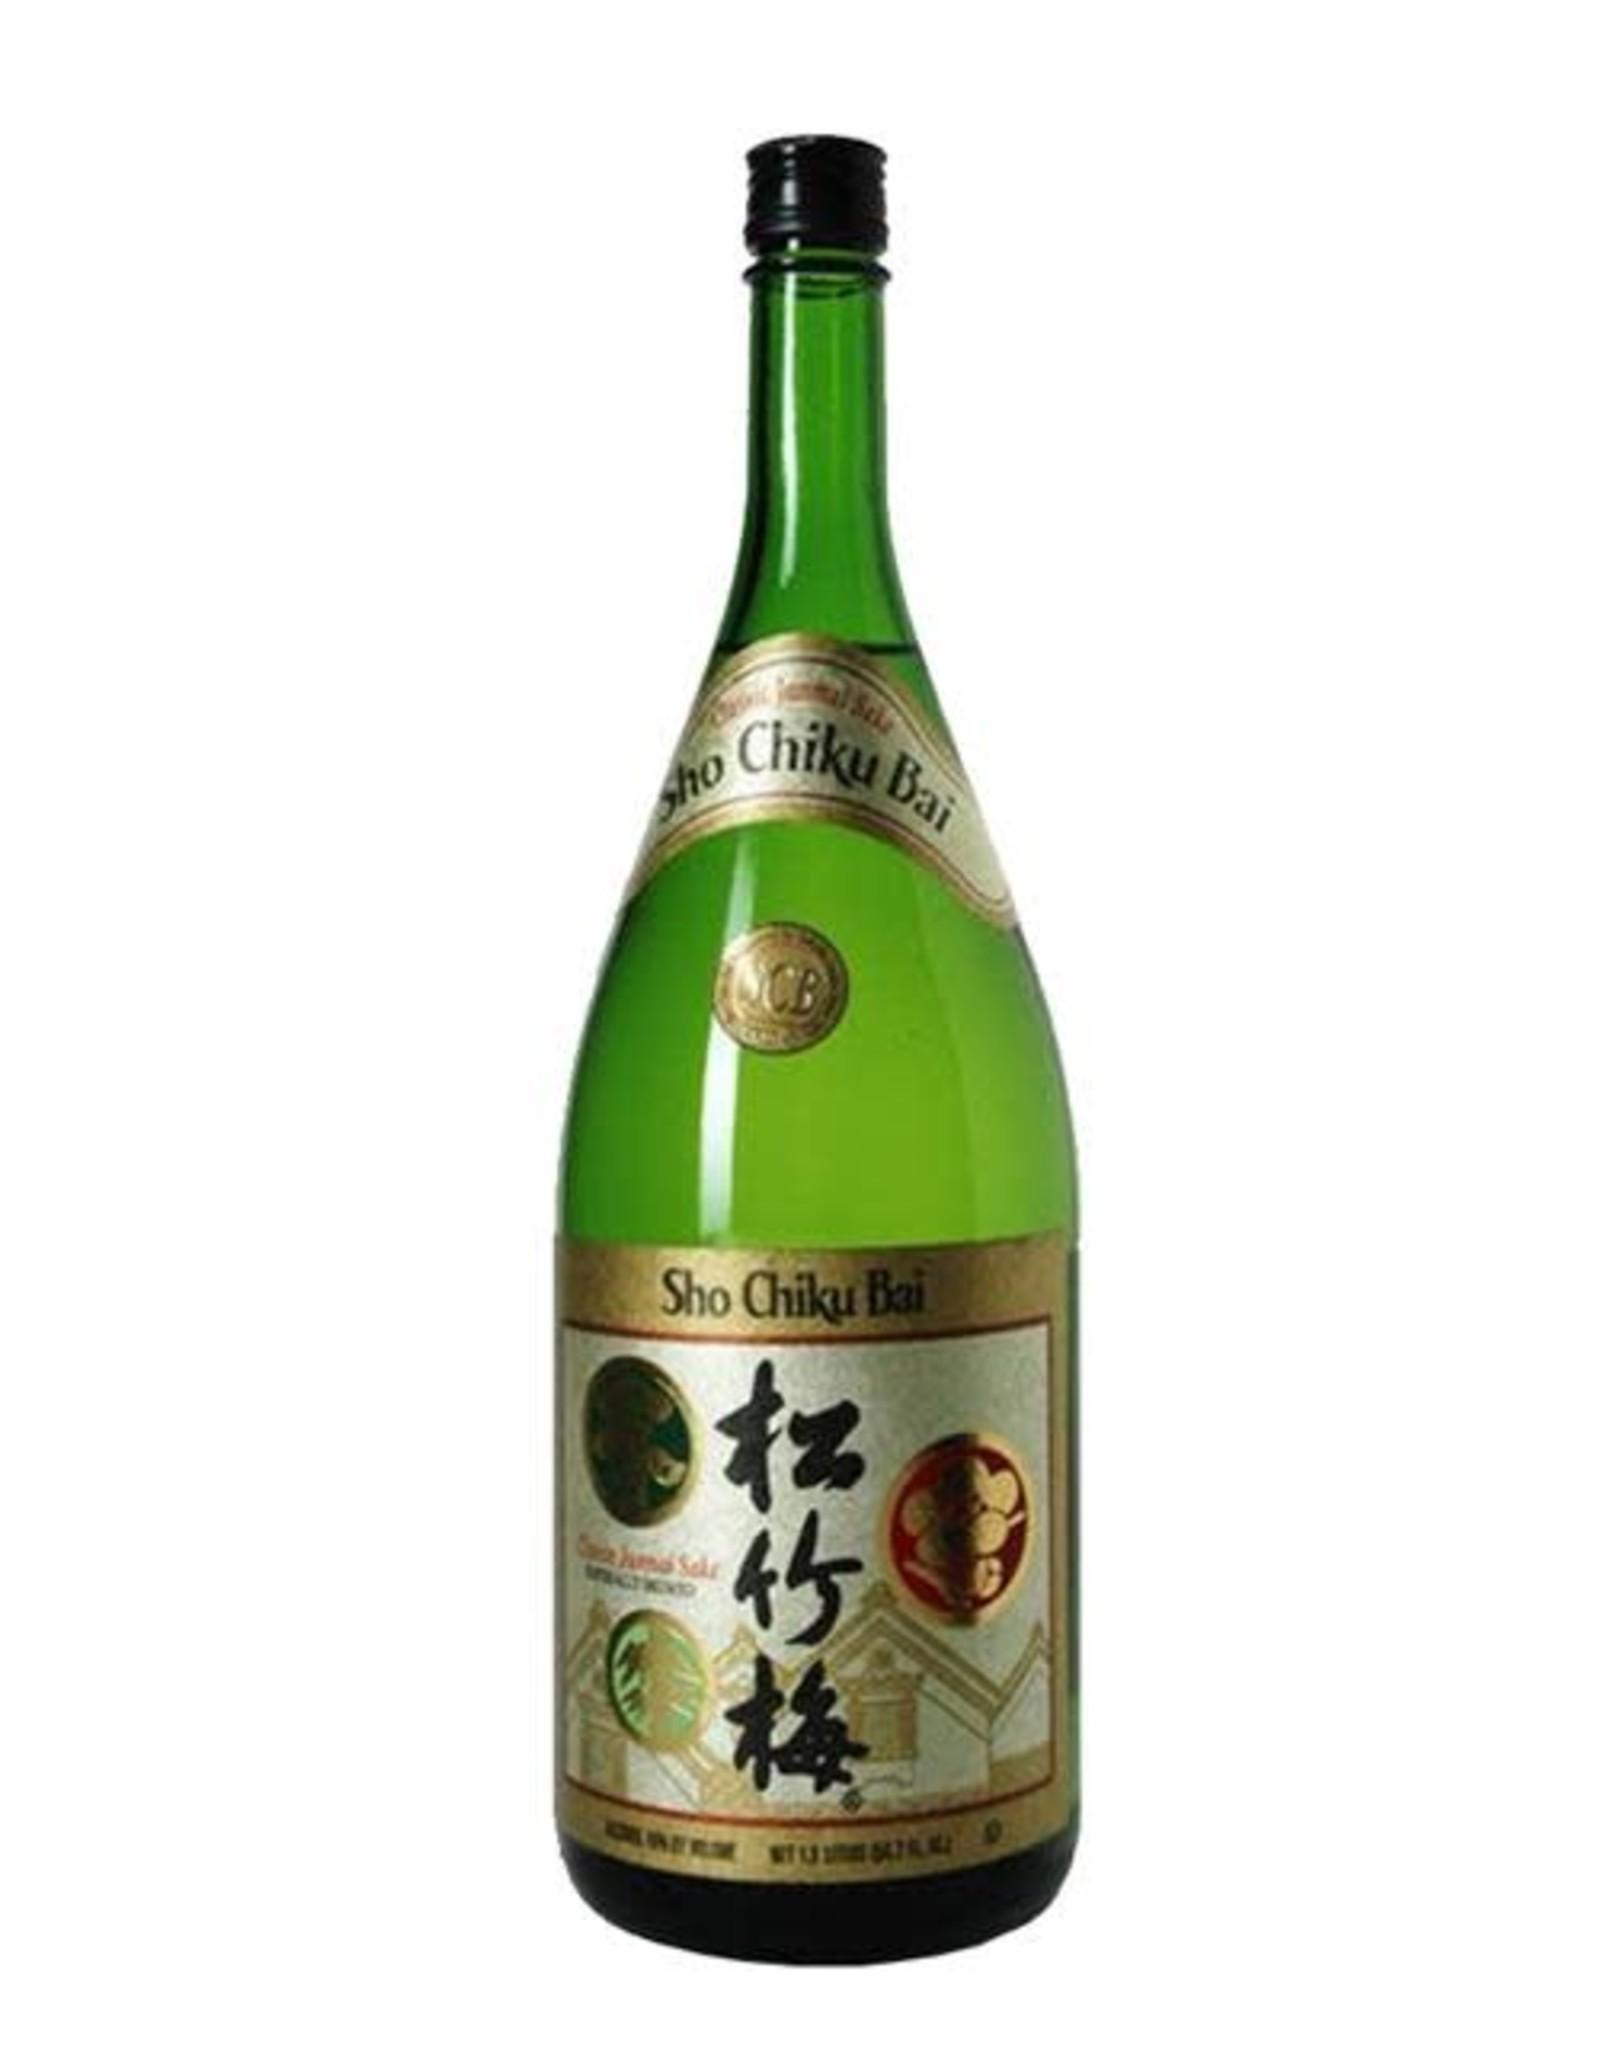 SHO CHIKU BAI 1.5L SAKE